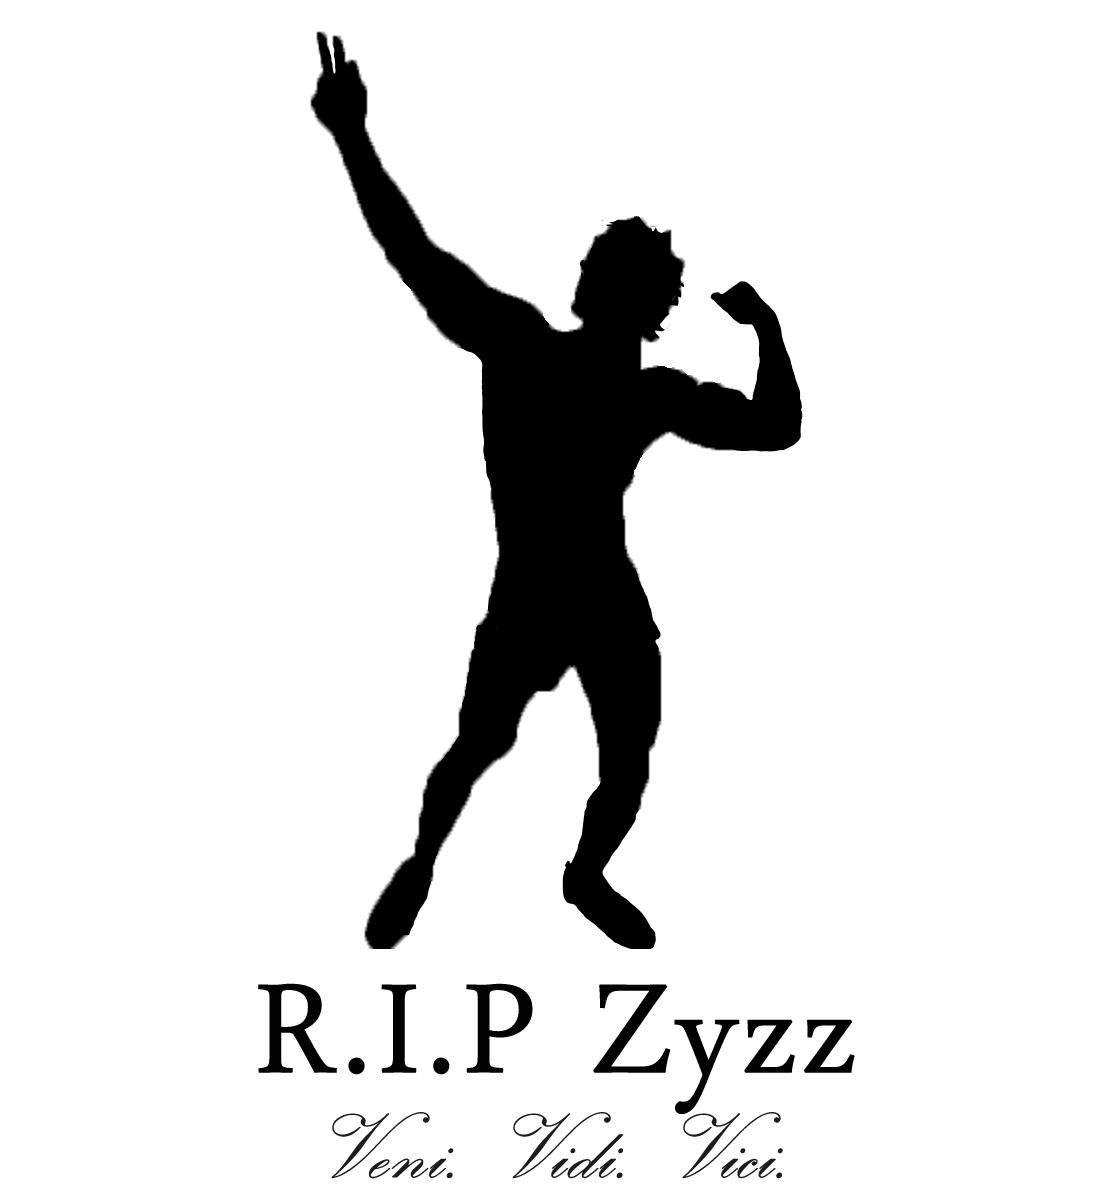 Zyzz Veni Vidi Vici Wallpaper 22638 Movieweb